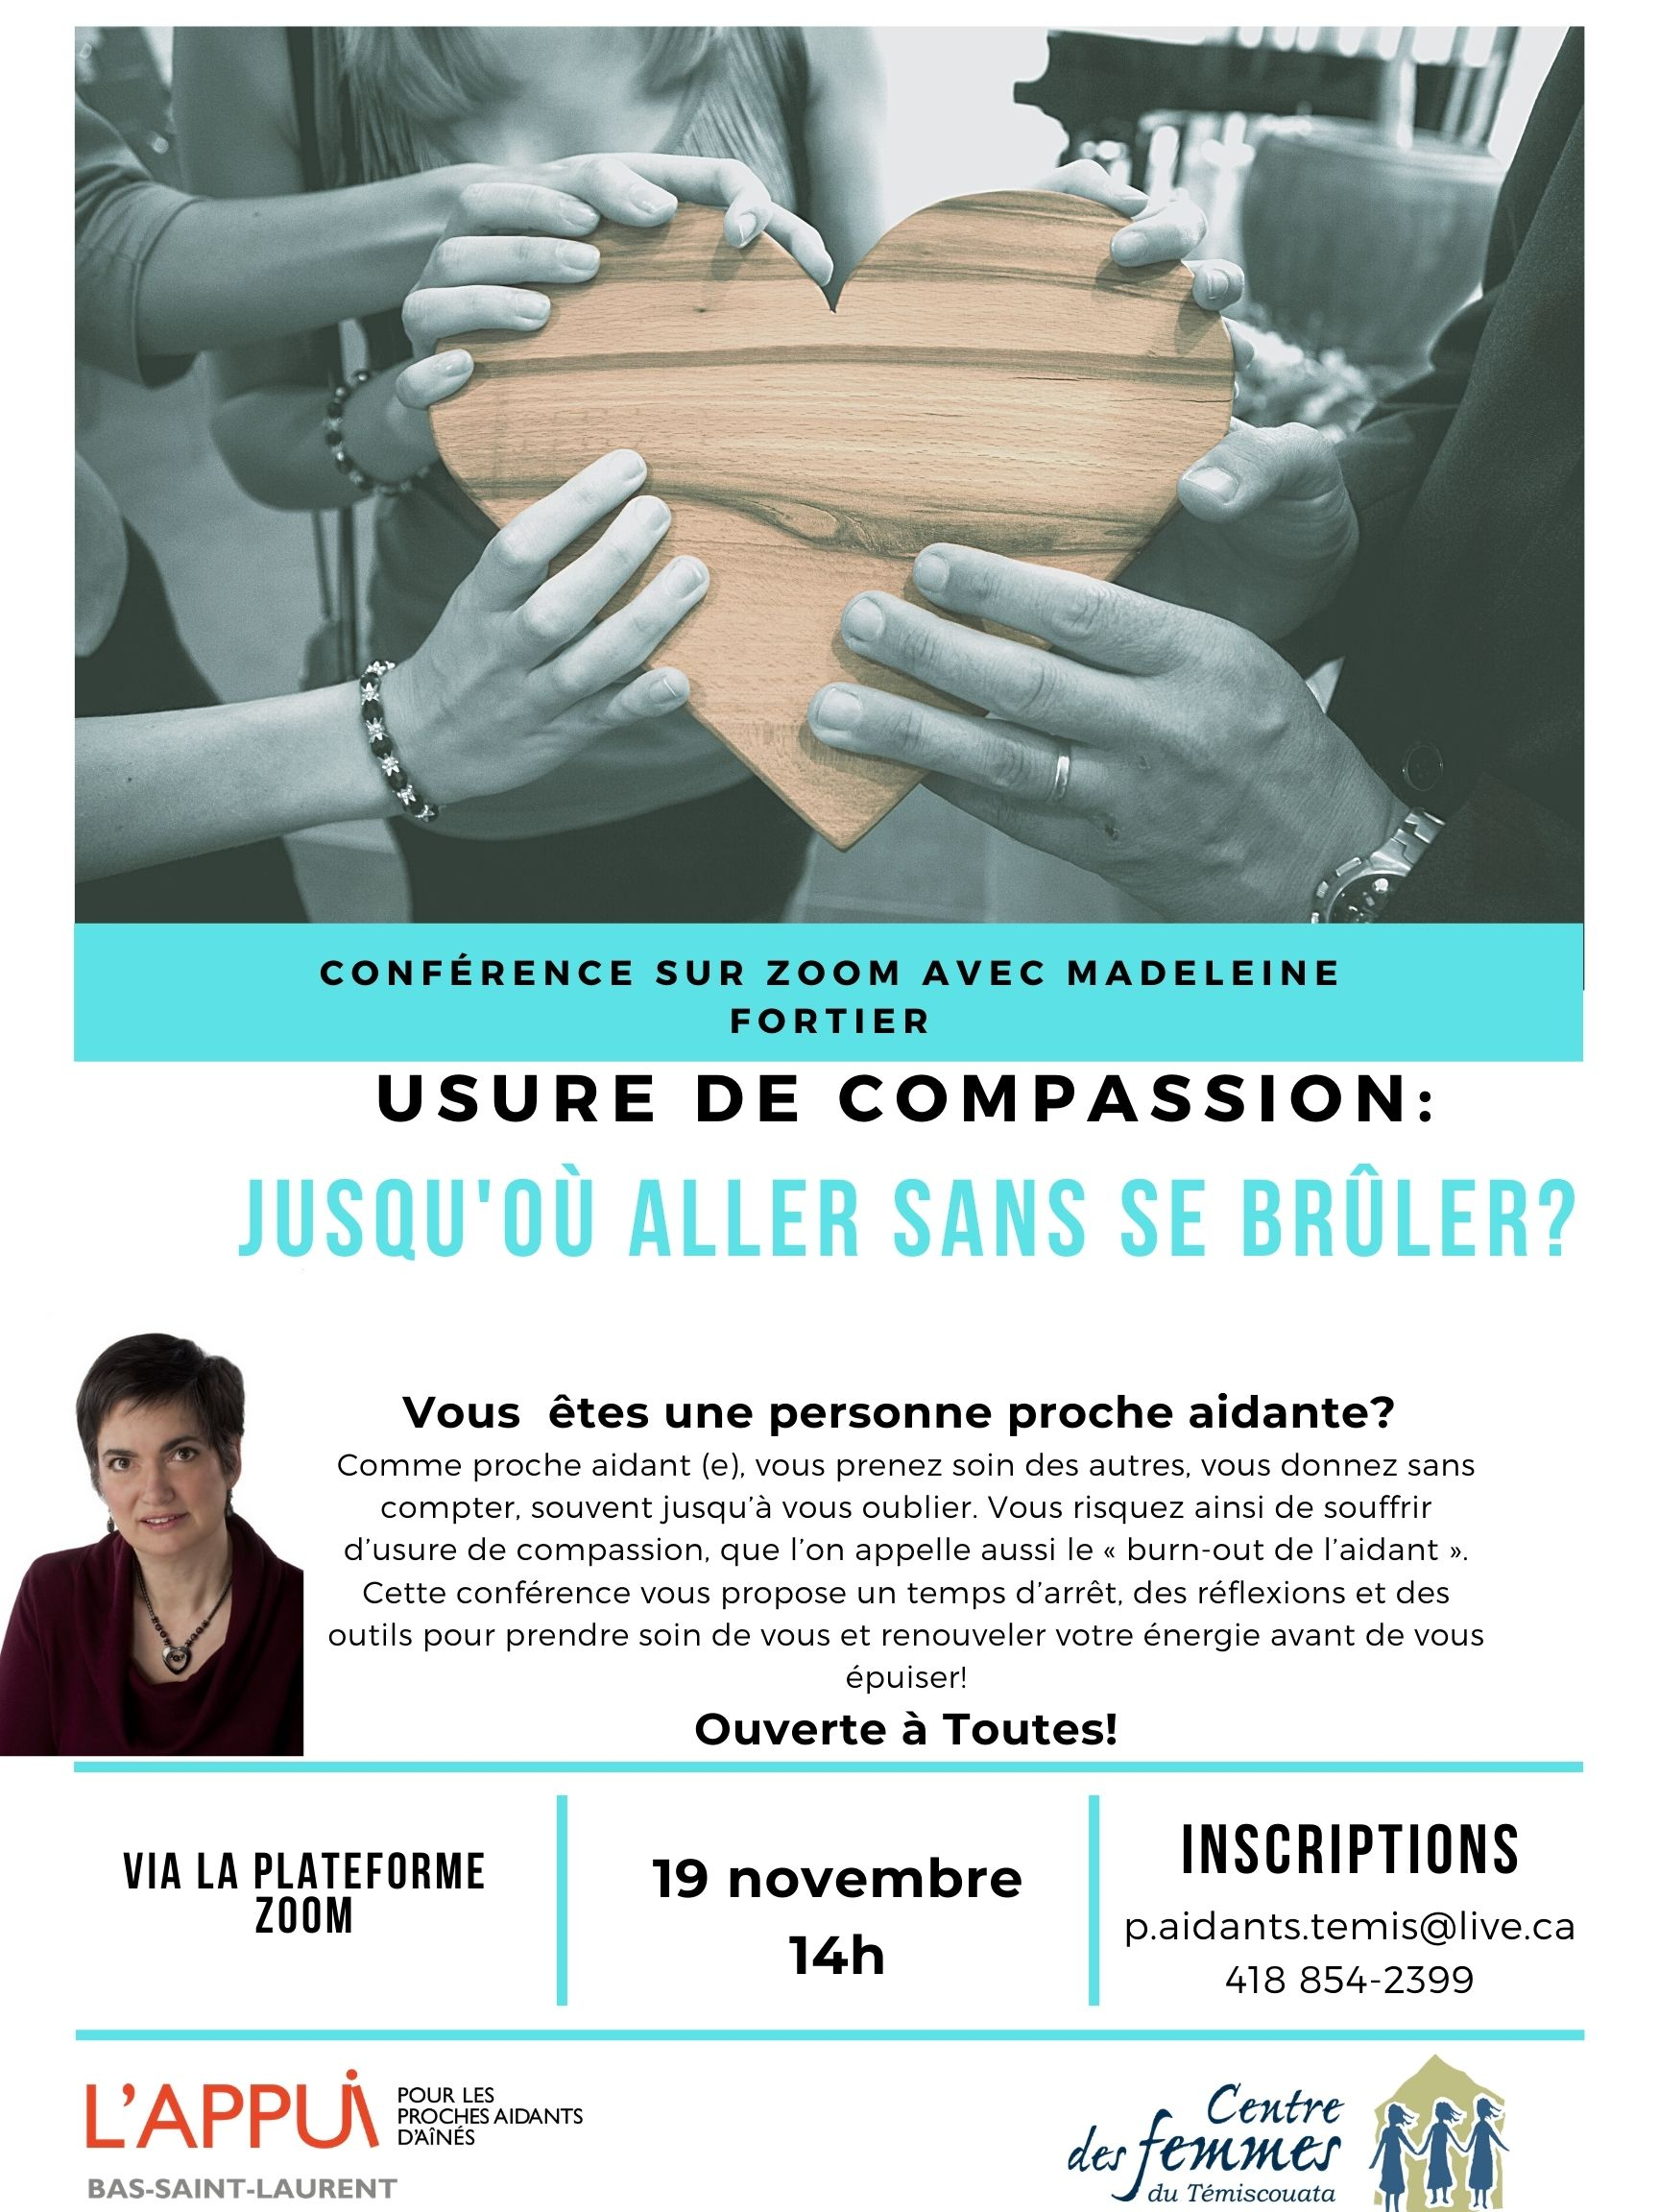 Usure de compassion 19nov